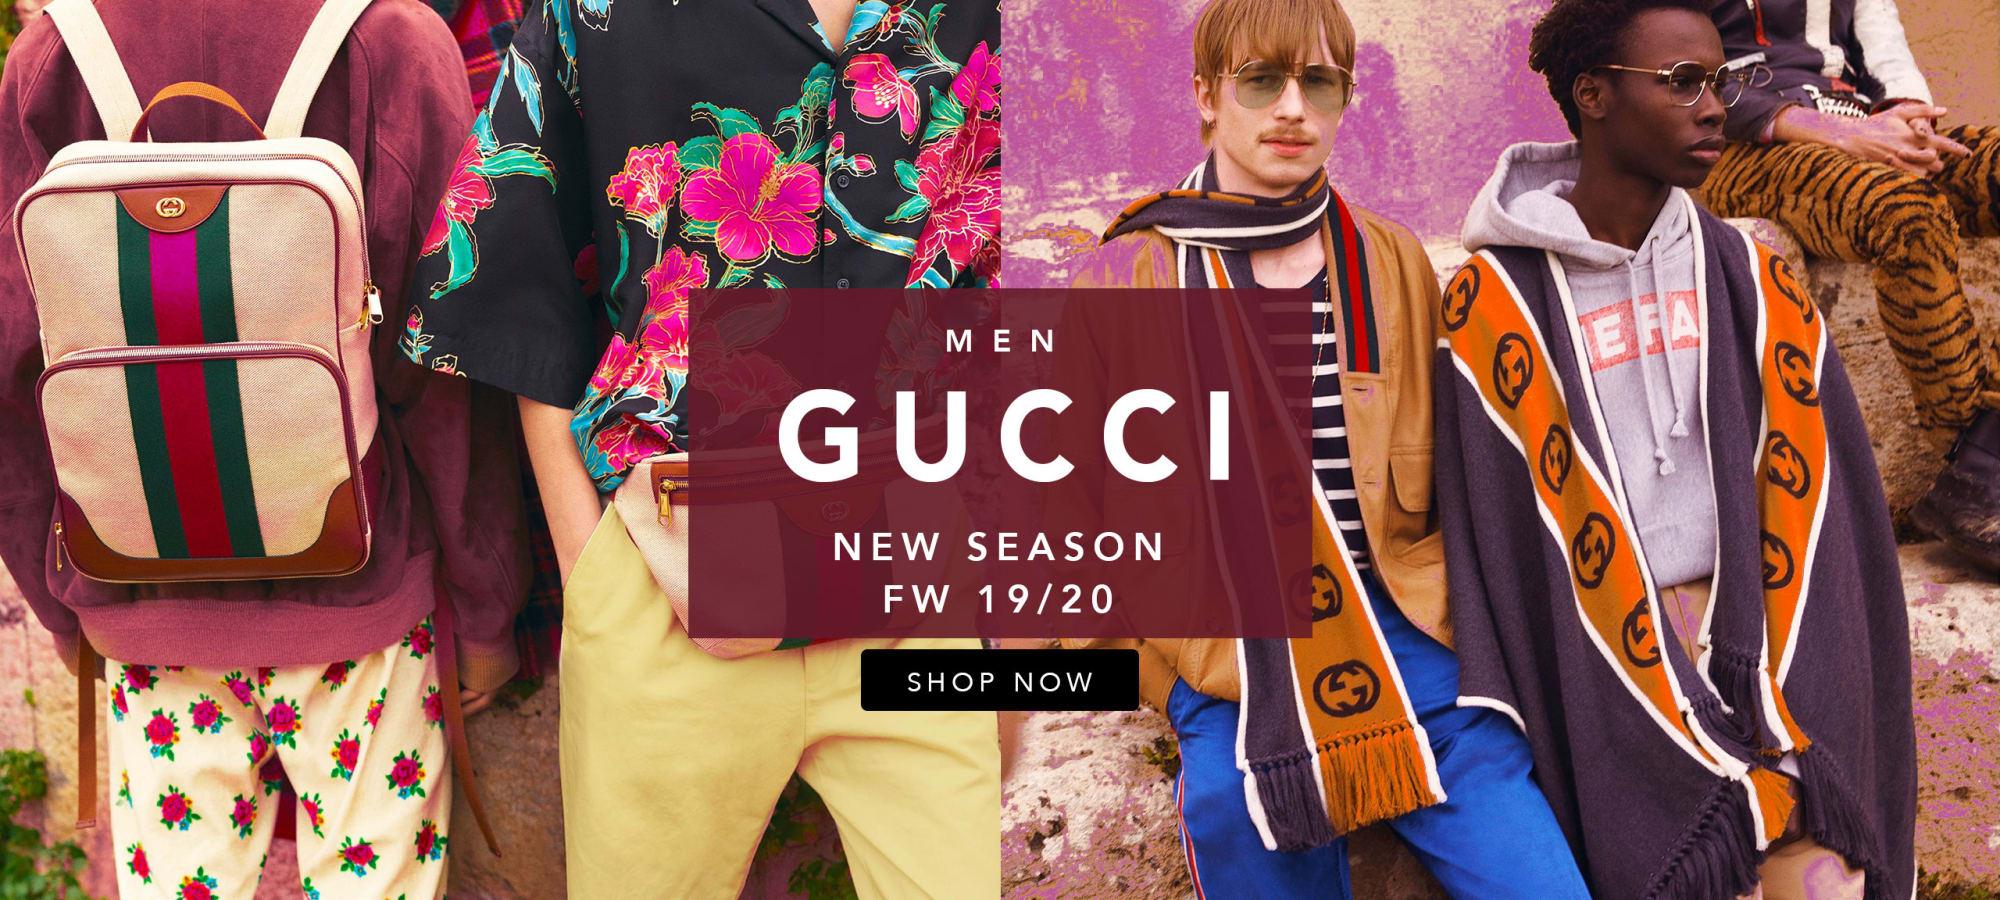 Gucci Men Fall Winter 19/20 by italist